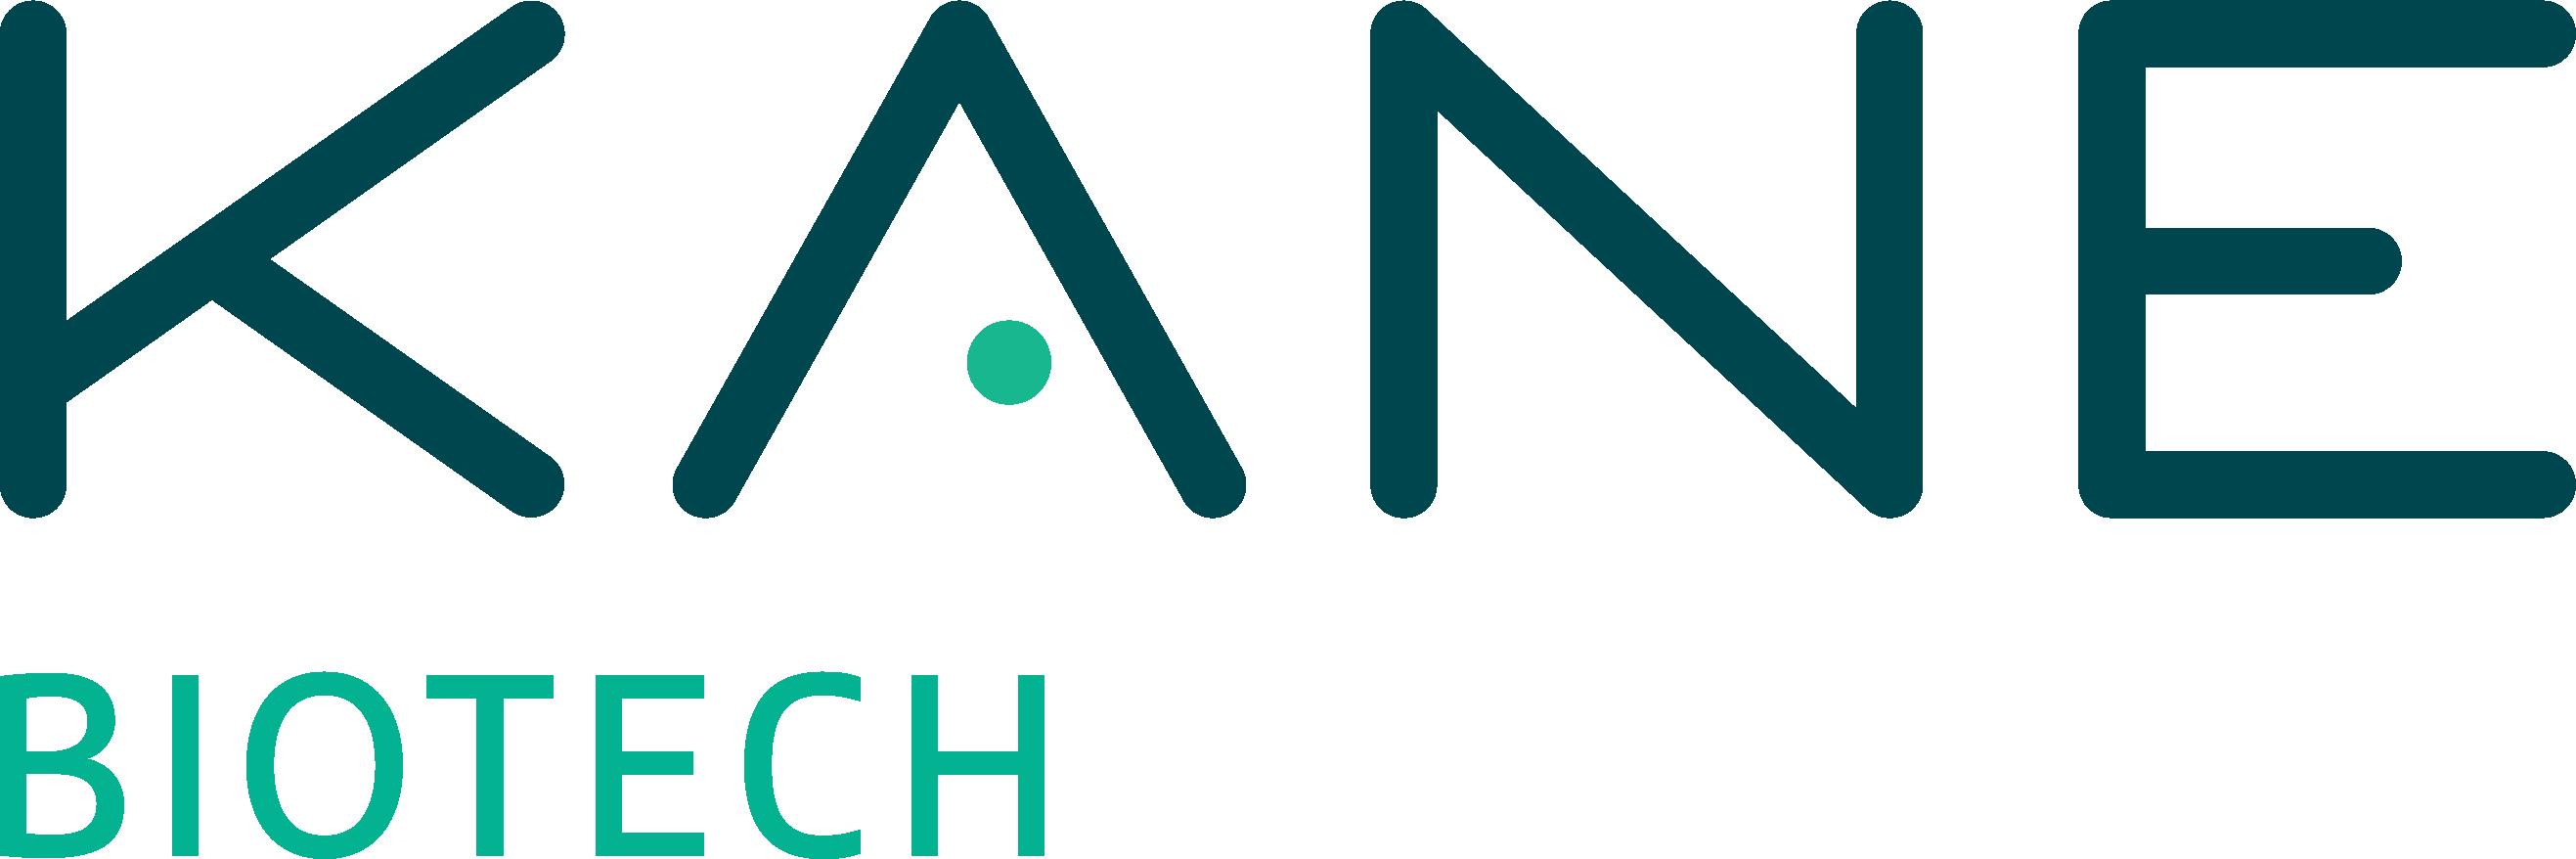 Kane Biotech Announces Grant of Stock Options